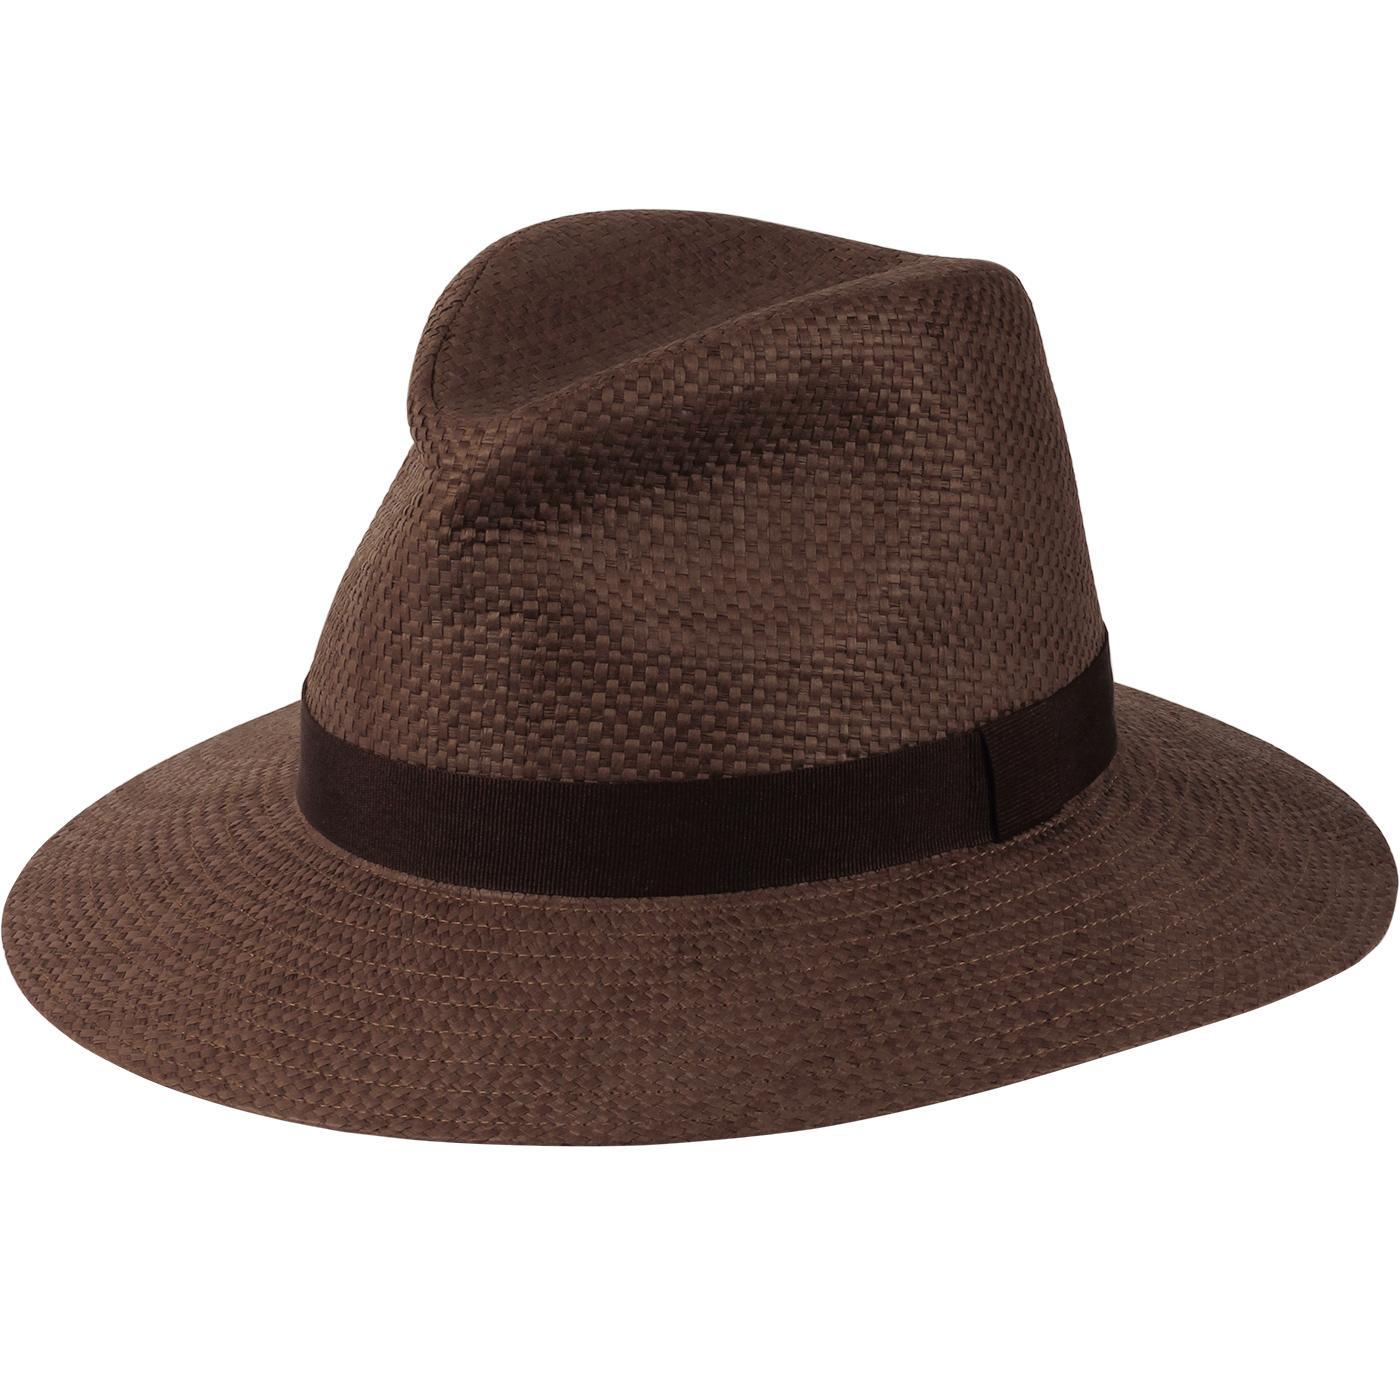 FAILSWORTH Straw Ambassador Fedora Hat (Tobacco)